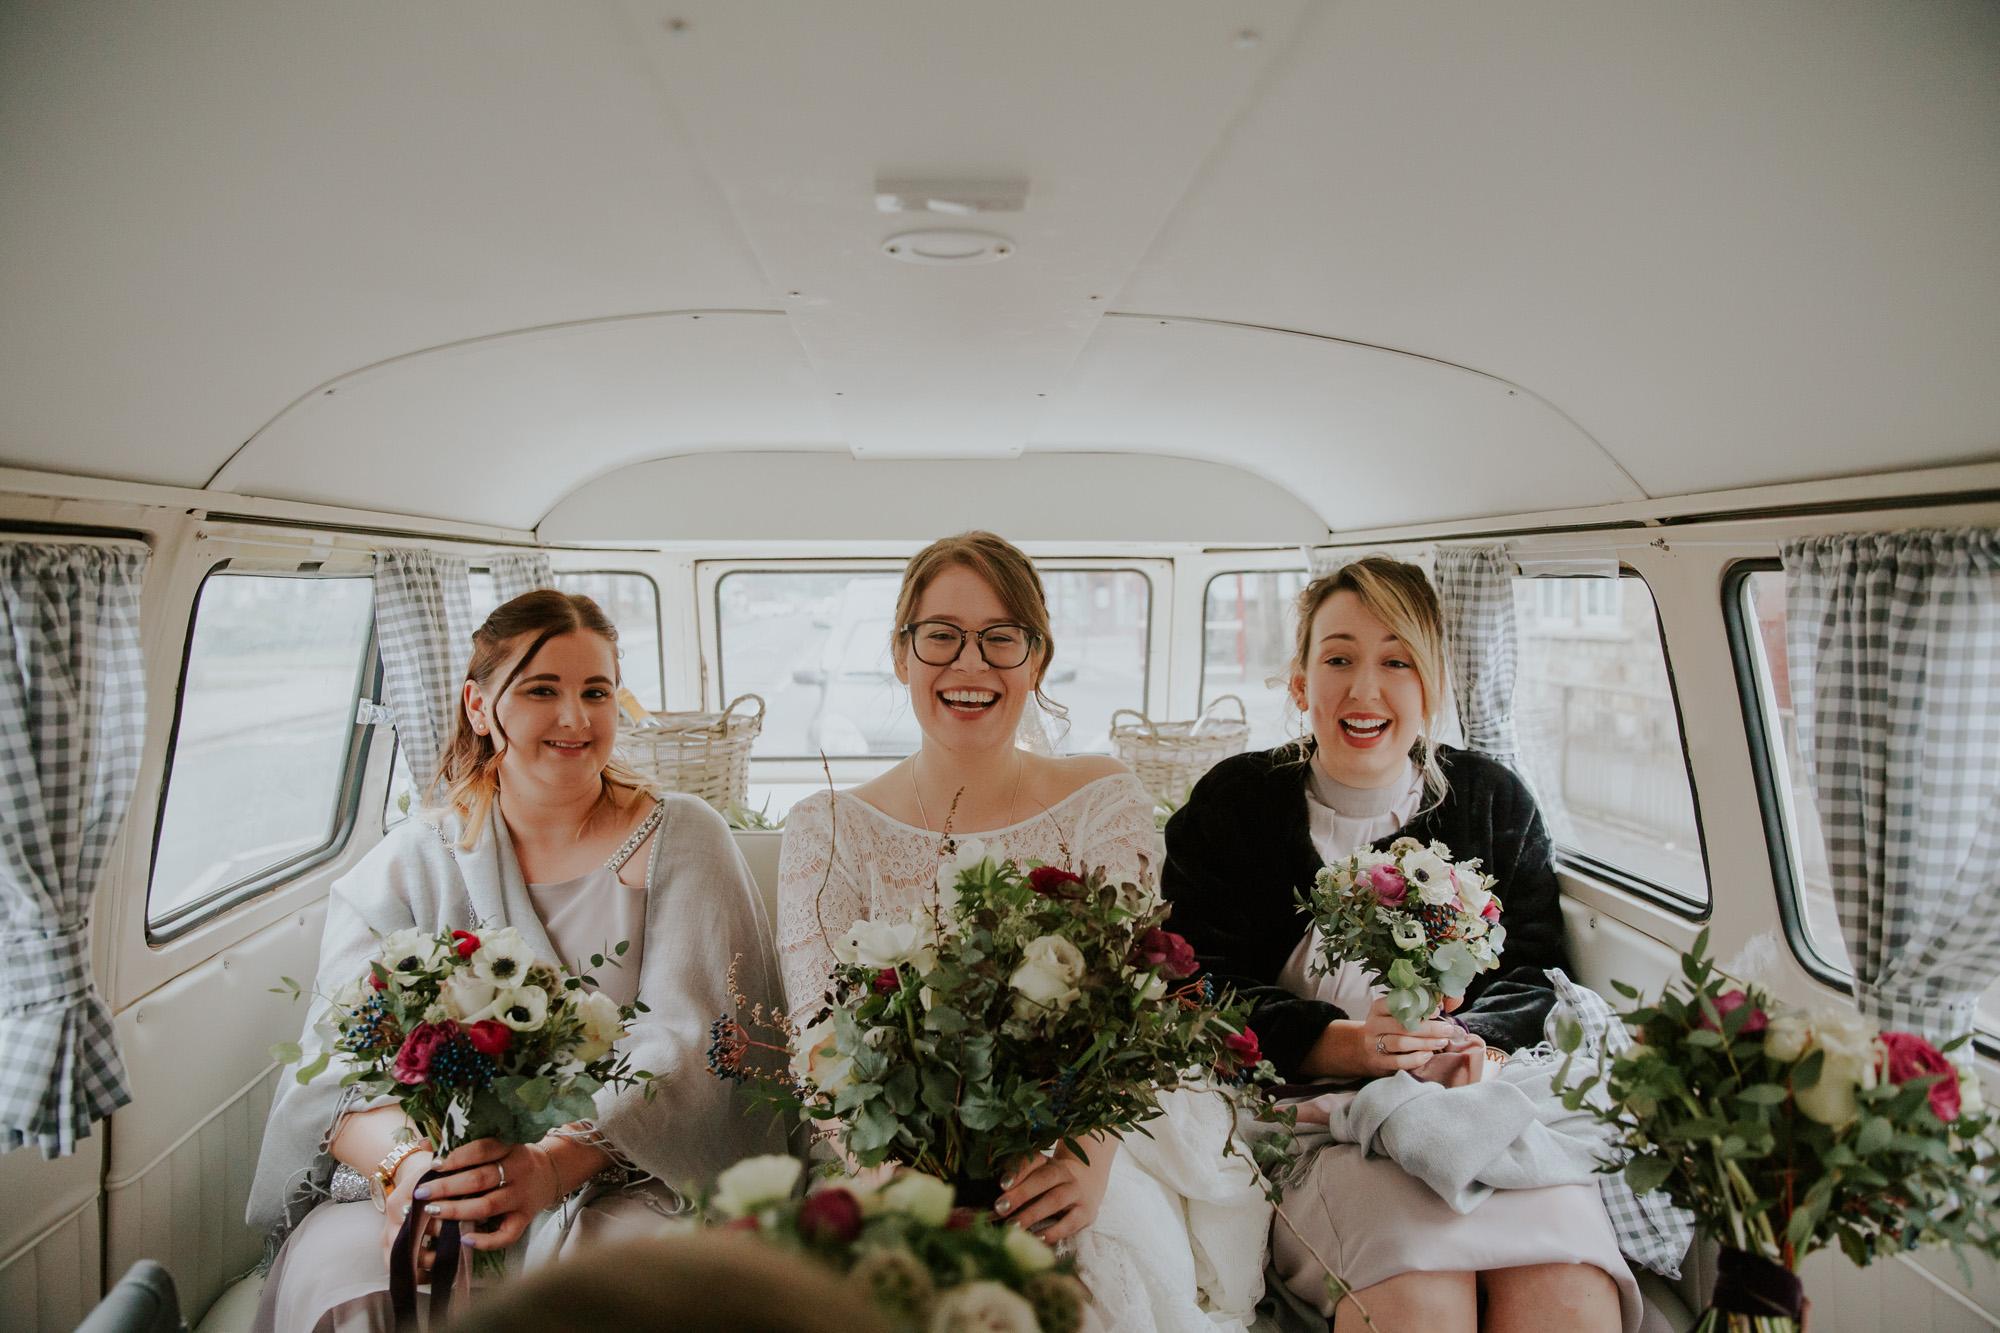 Kate-Beaumont-Bespoke-Bridal-Dahlia-Lace-Wedding-Gown-Cool-Leeds-Wedding-2.jpg